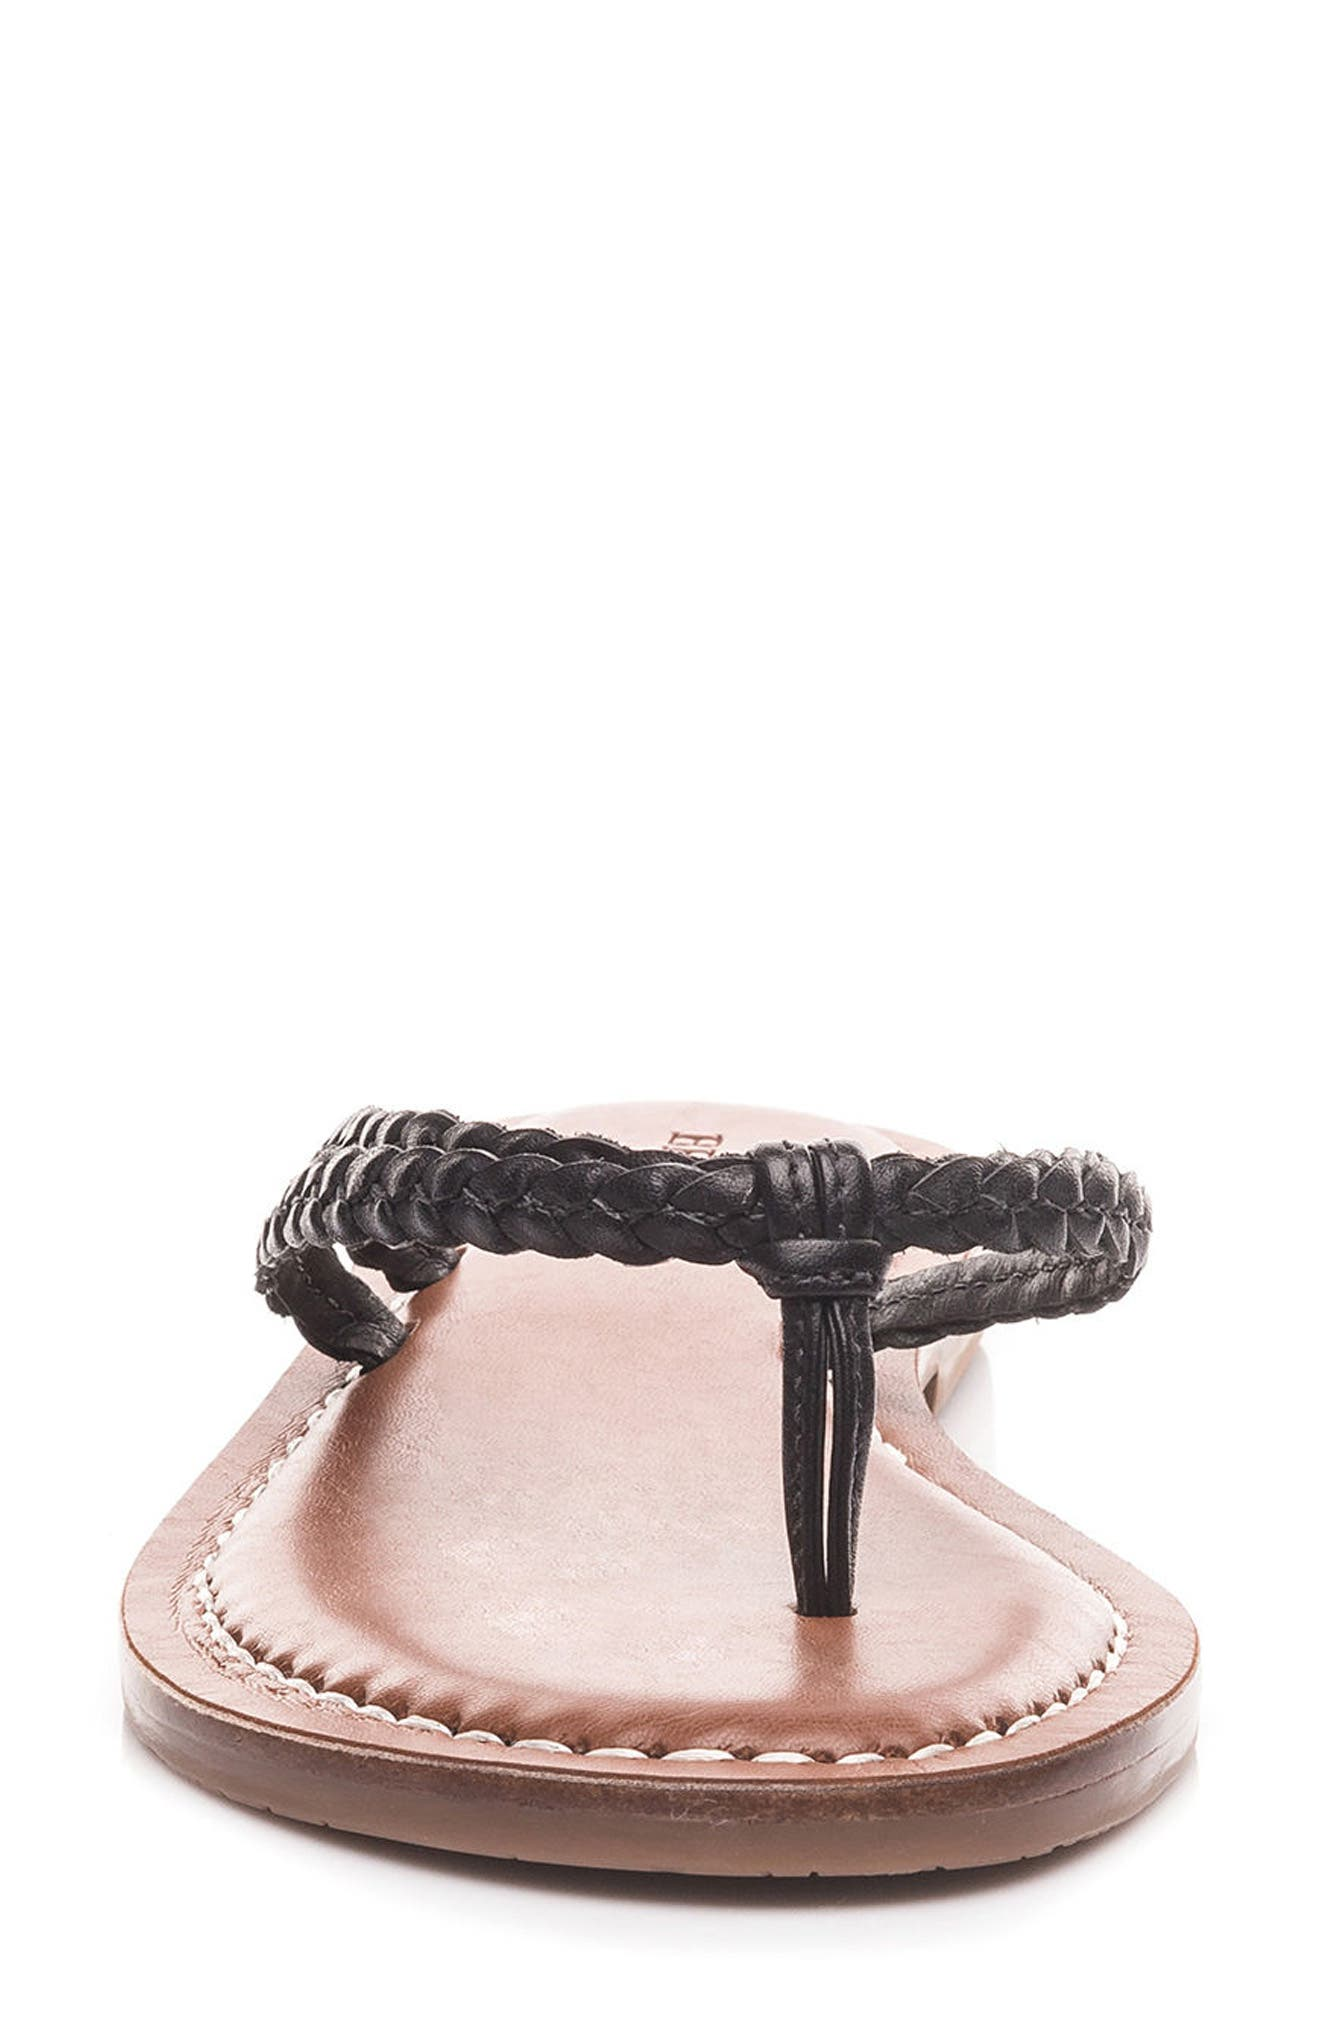 Bernardo Greta Braided Strap Sandal,                             Alternate thumbnail 4, color,                             Black Leather